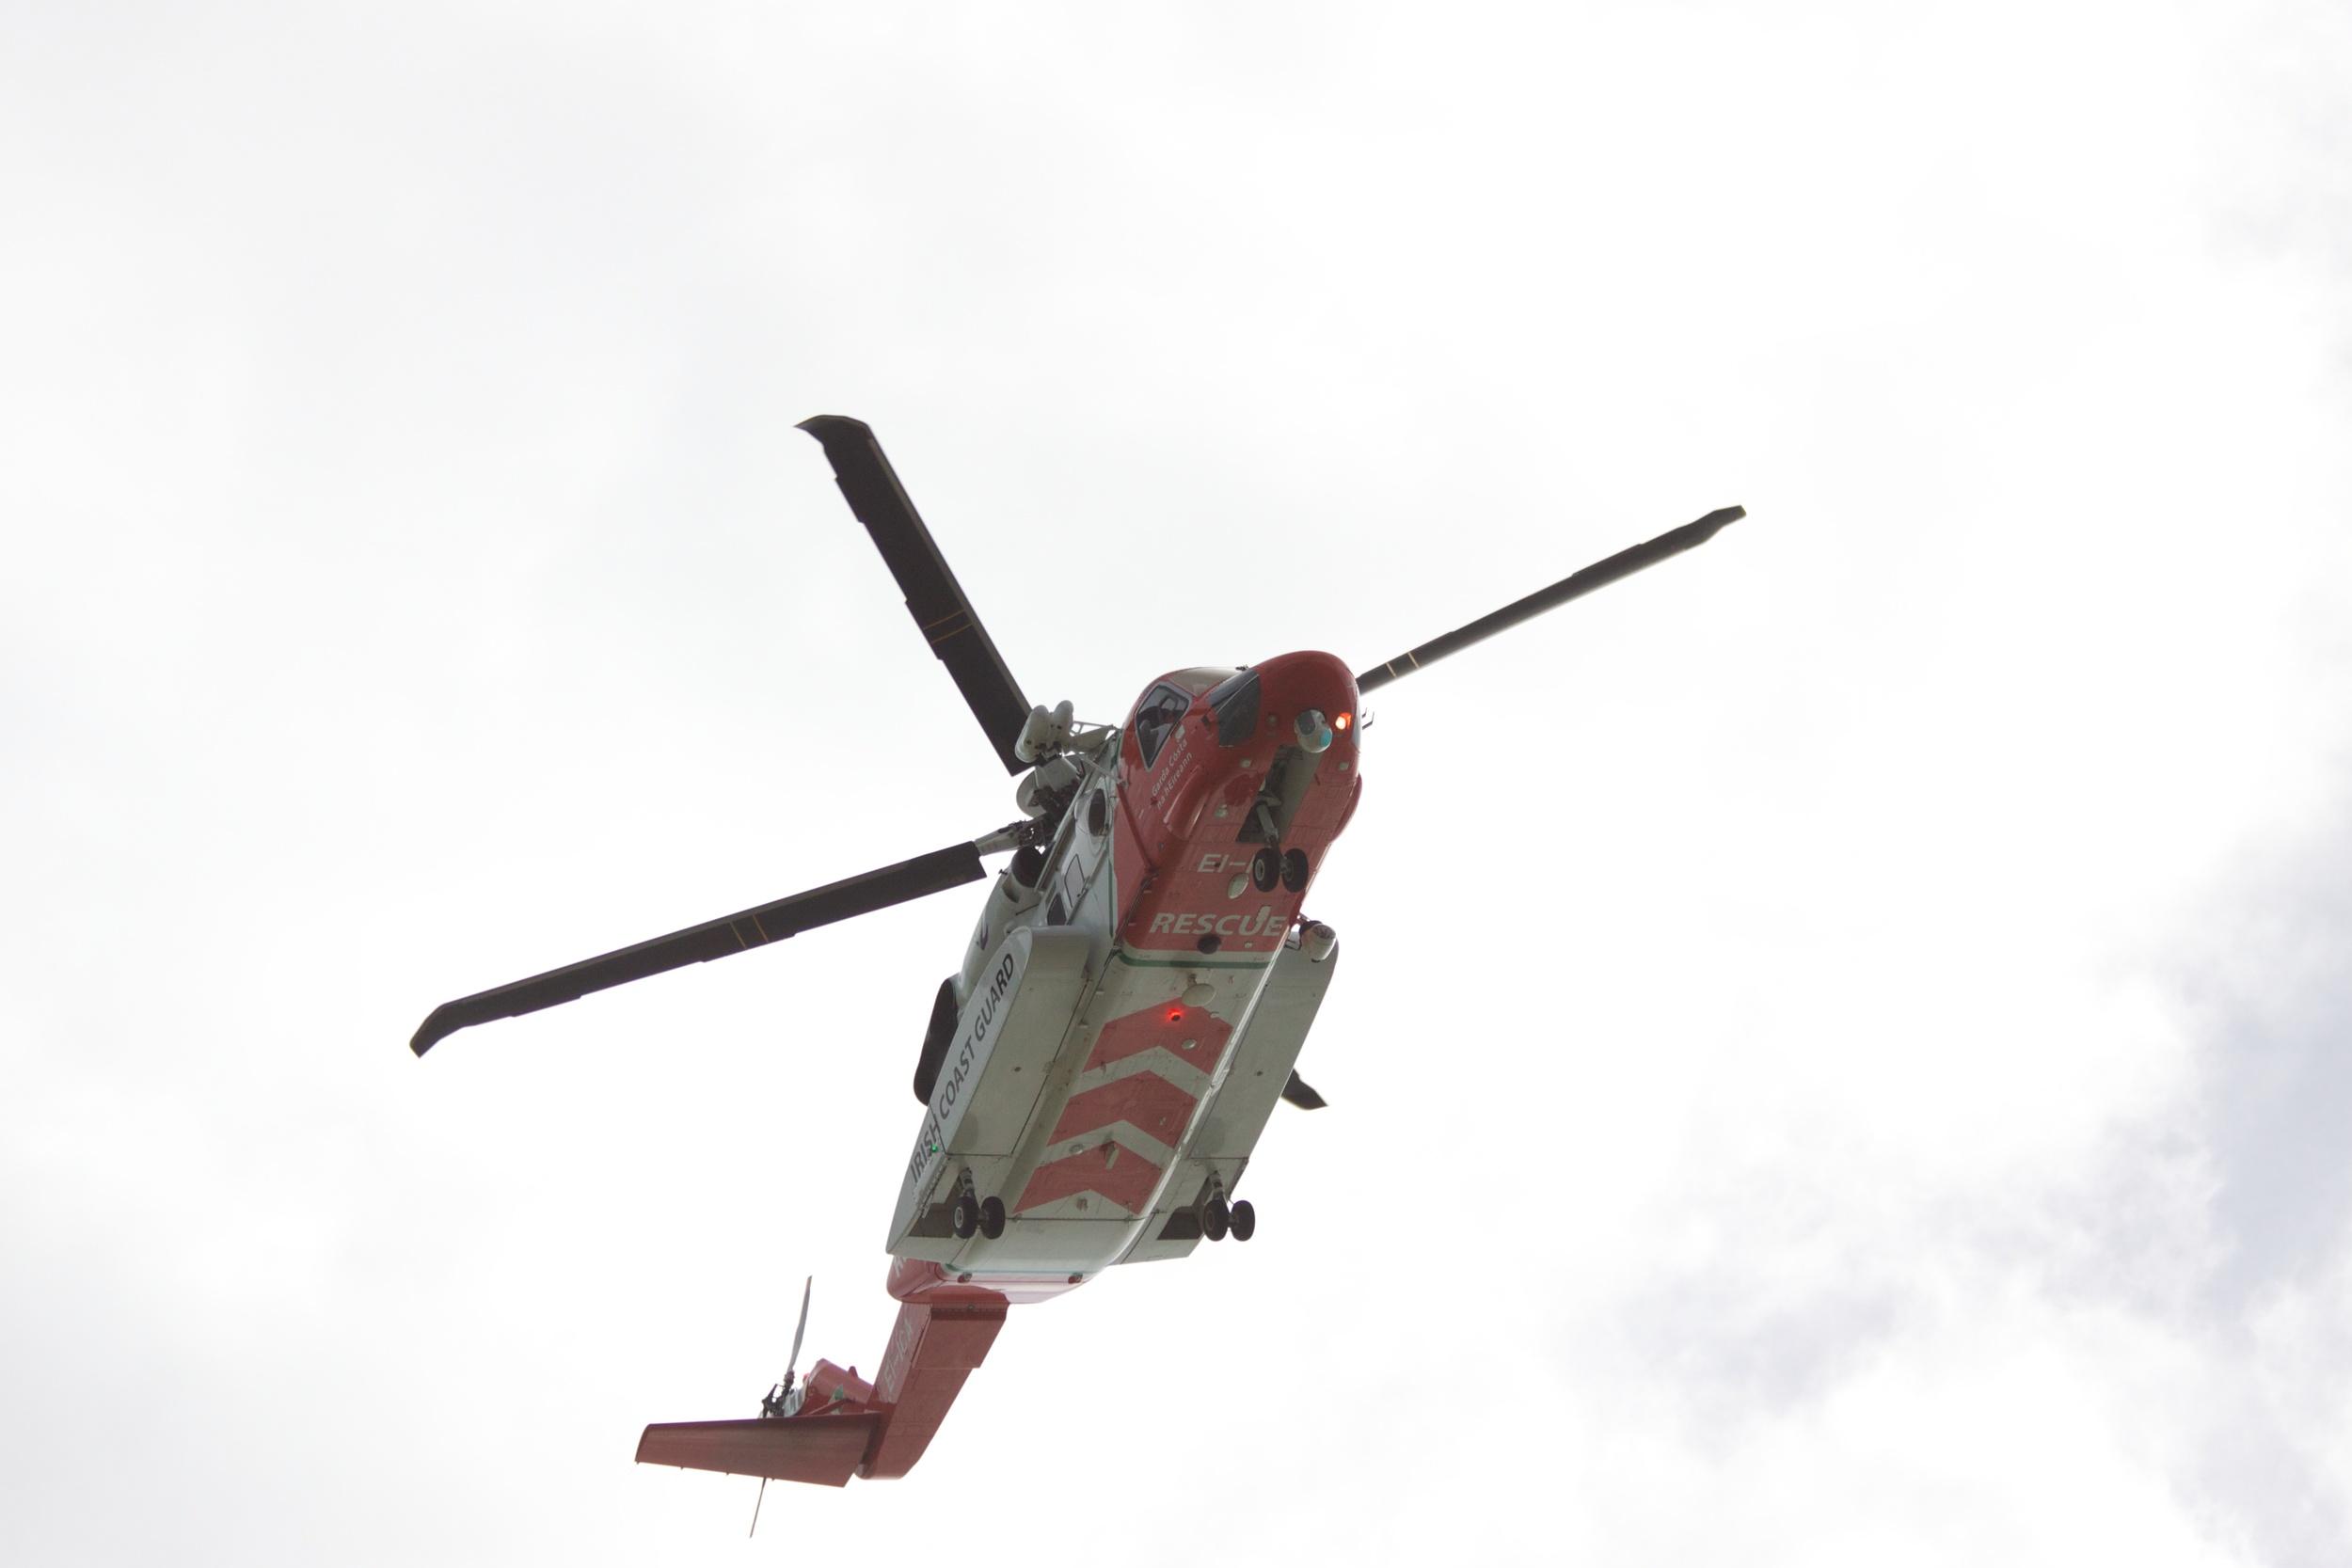 Irish Coast Guard Helicopter R116